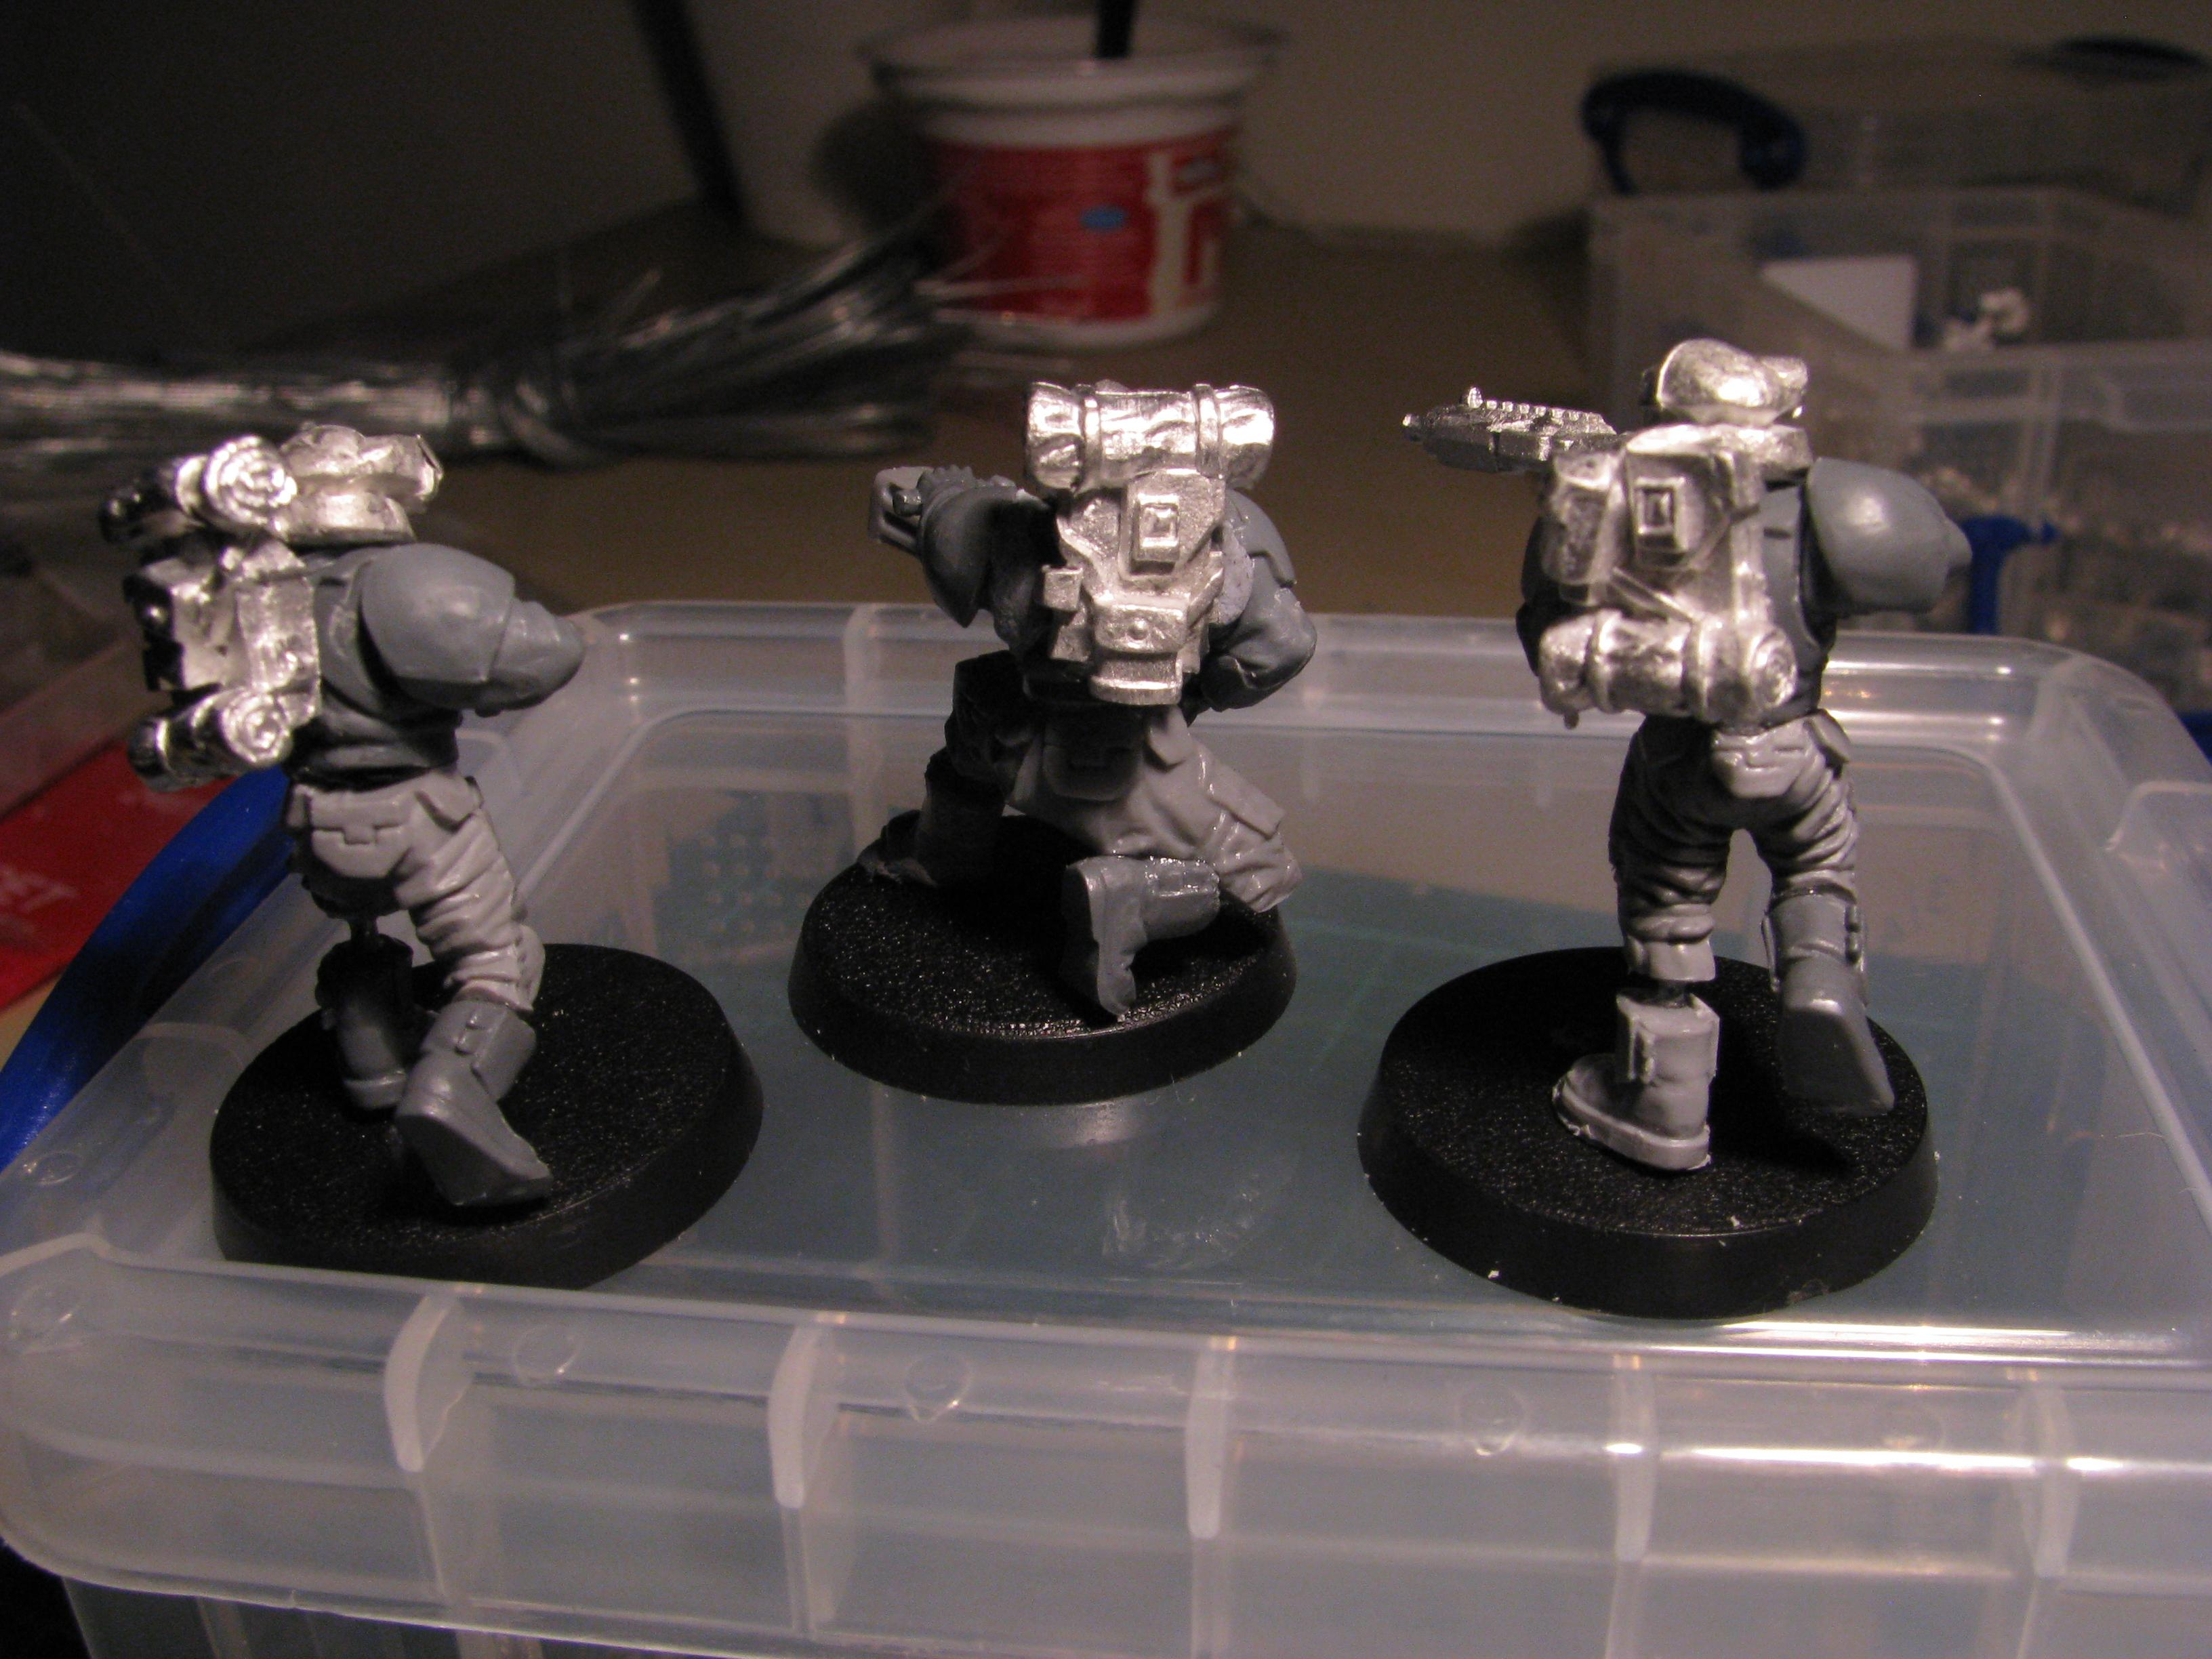 Conversion, Guard, Pig Iron, Stormtrooper